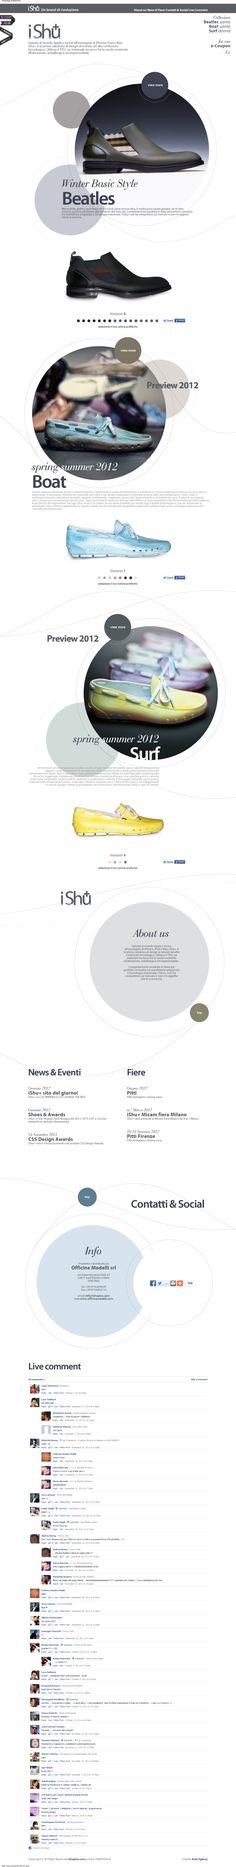 Web Design Inspiration - www.ishuplus.com/IT.php